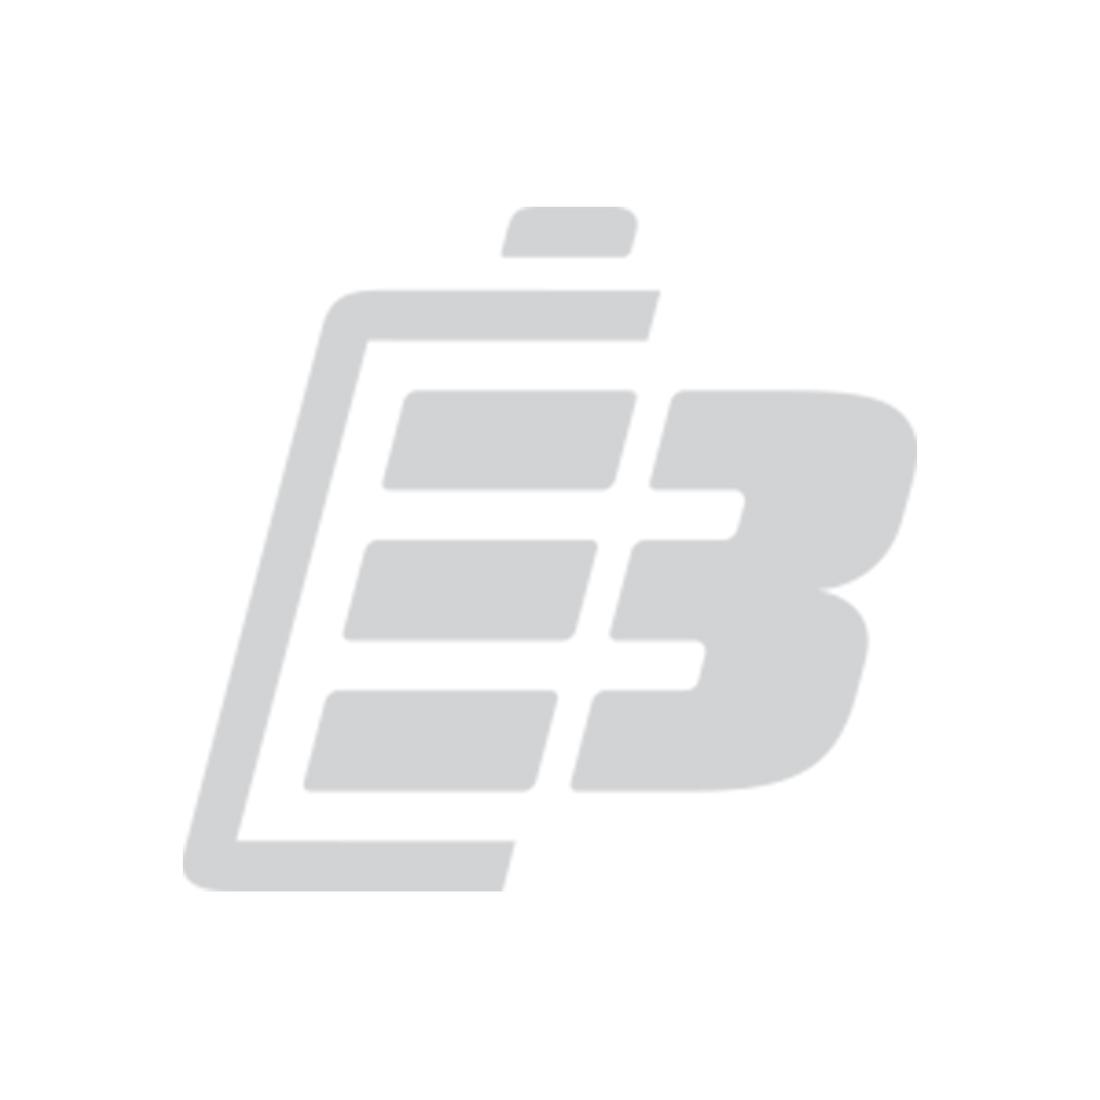 Cordless phone battery Siemens Gigaset SL78H_1